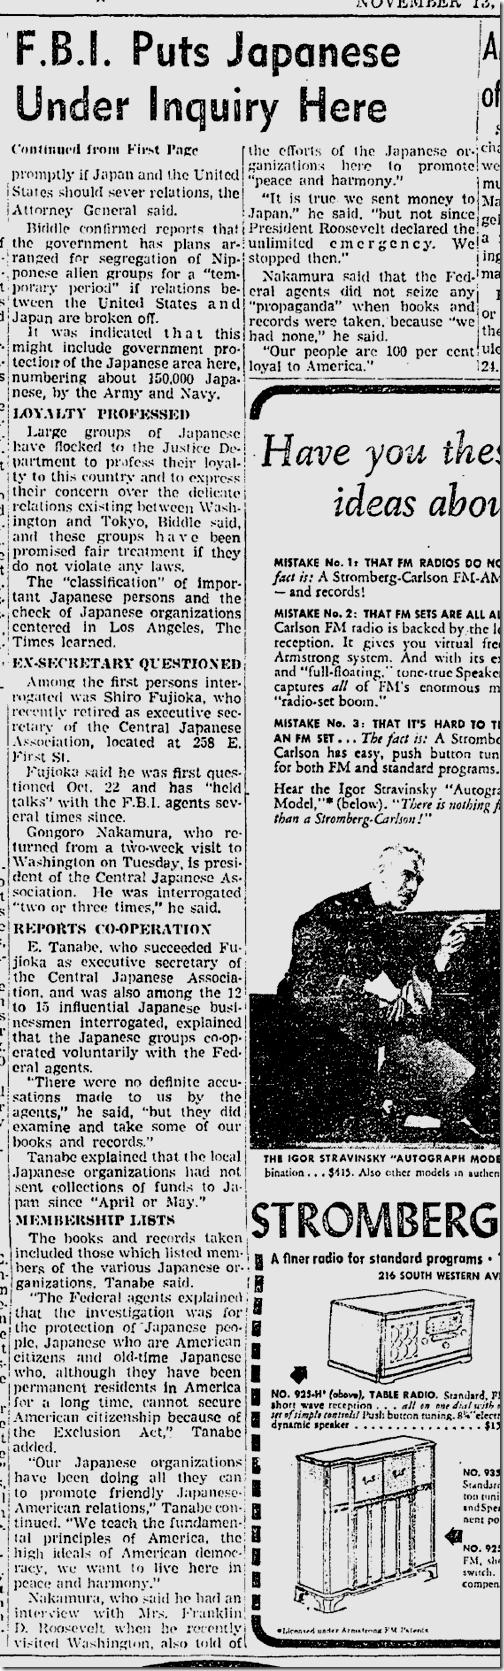 Nov. 13, 1941, Japanese